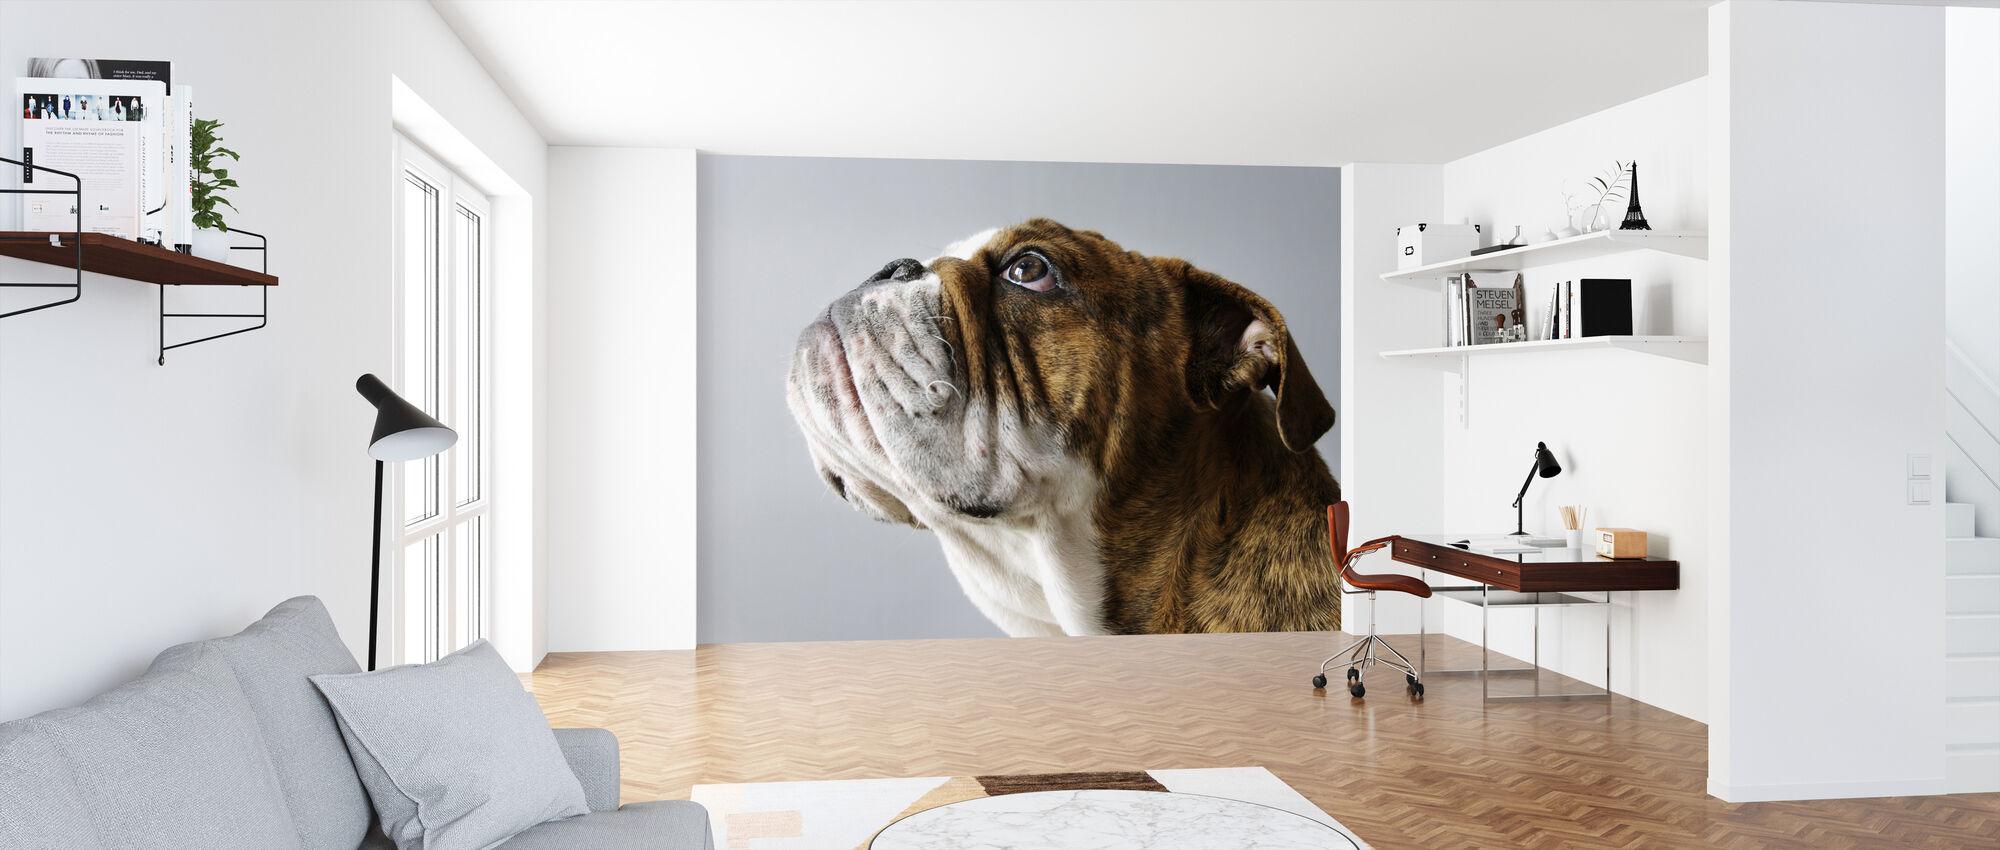 English Bulldog - Wallpaper - Office